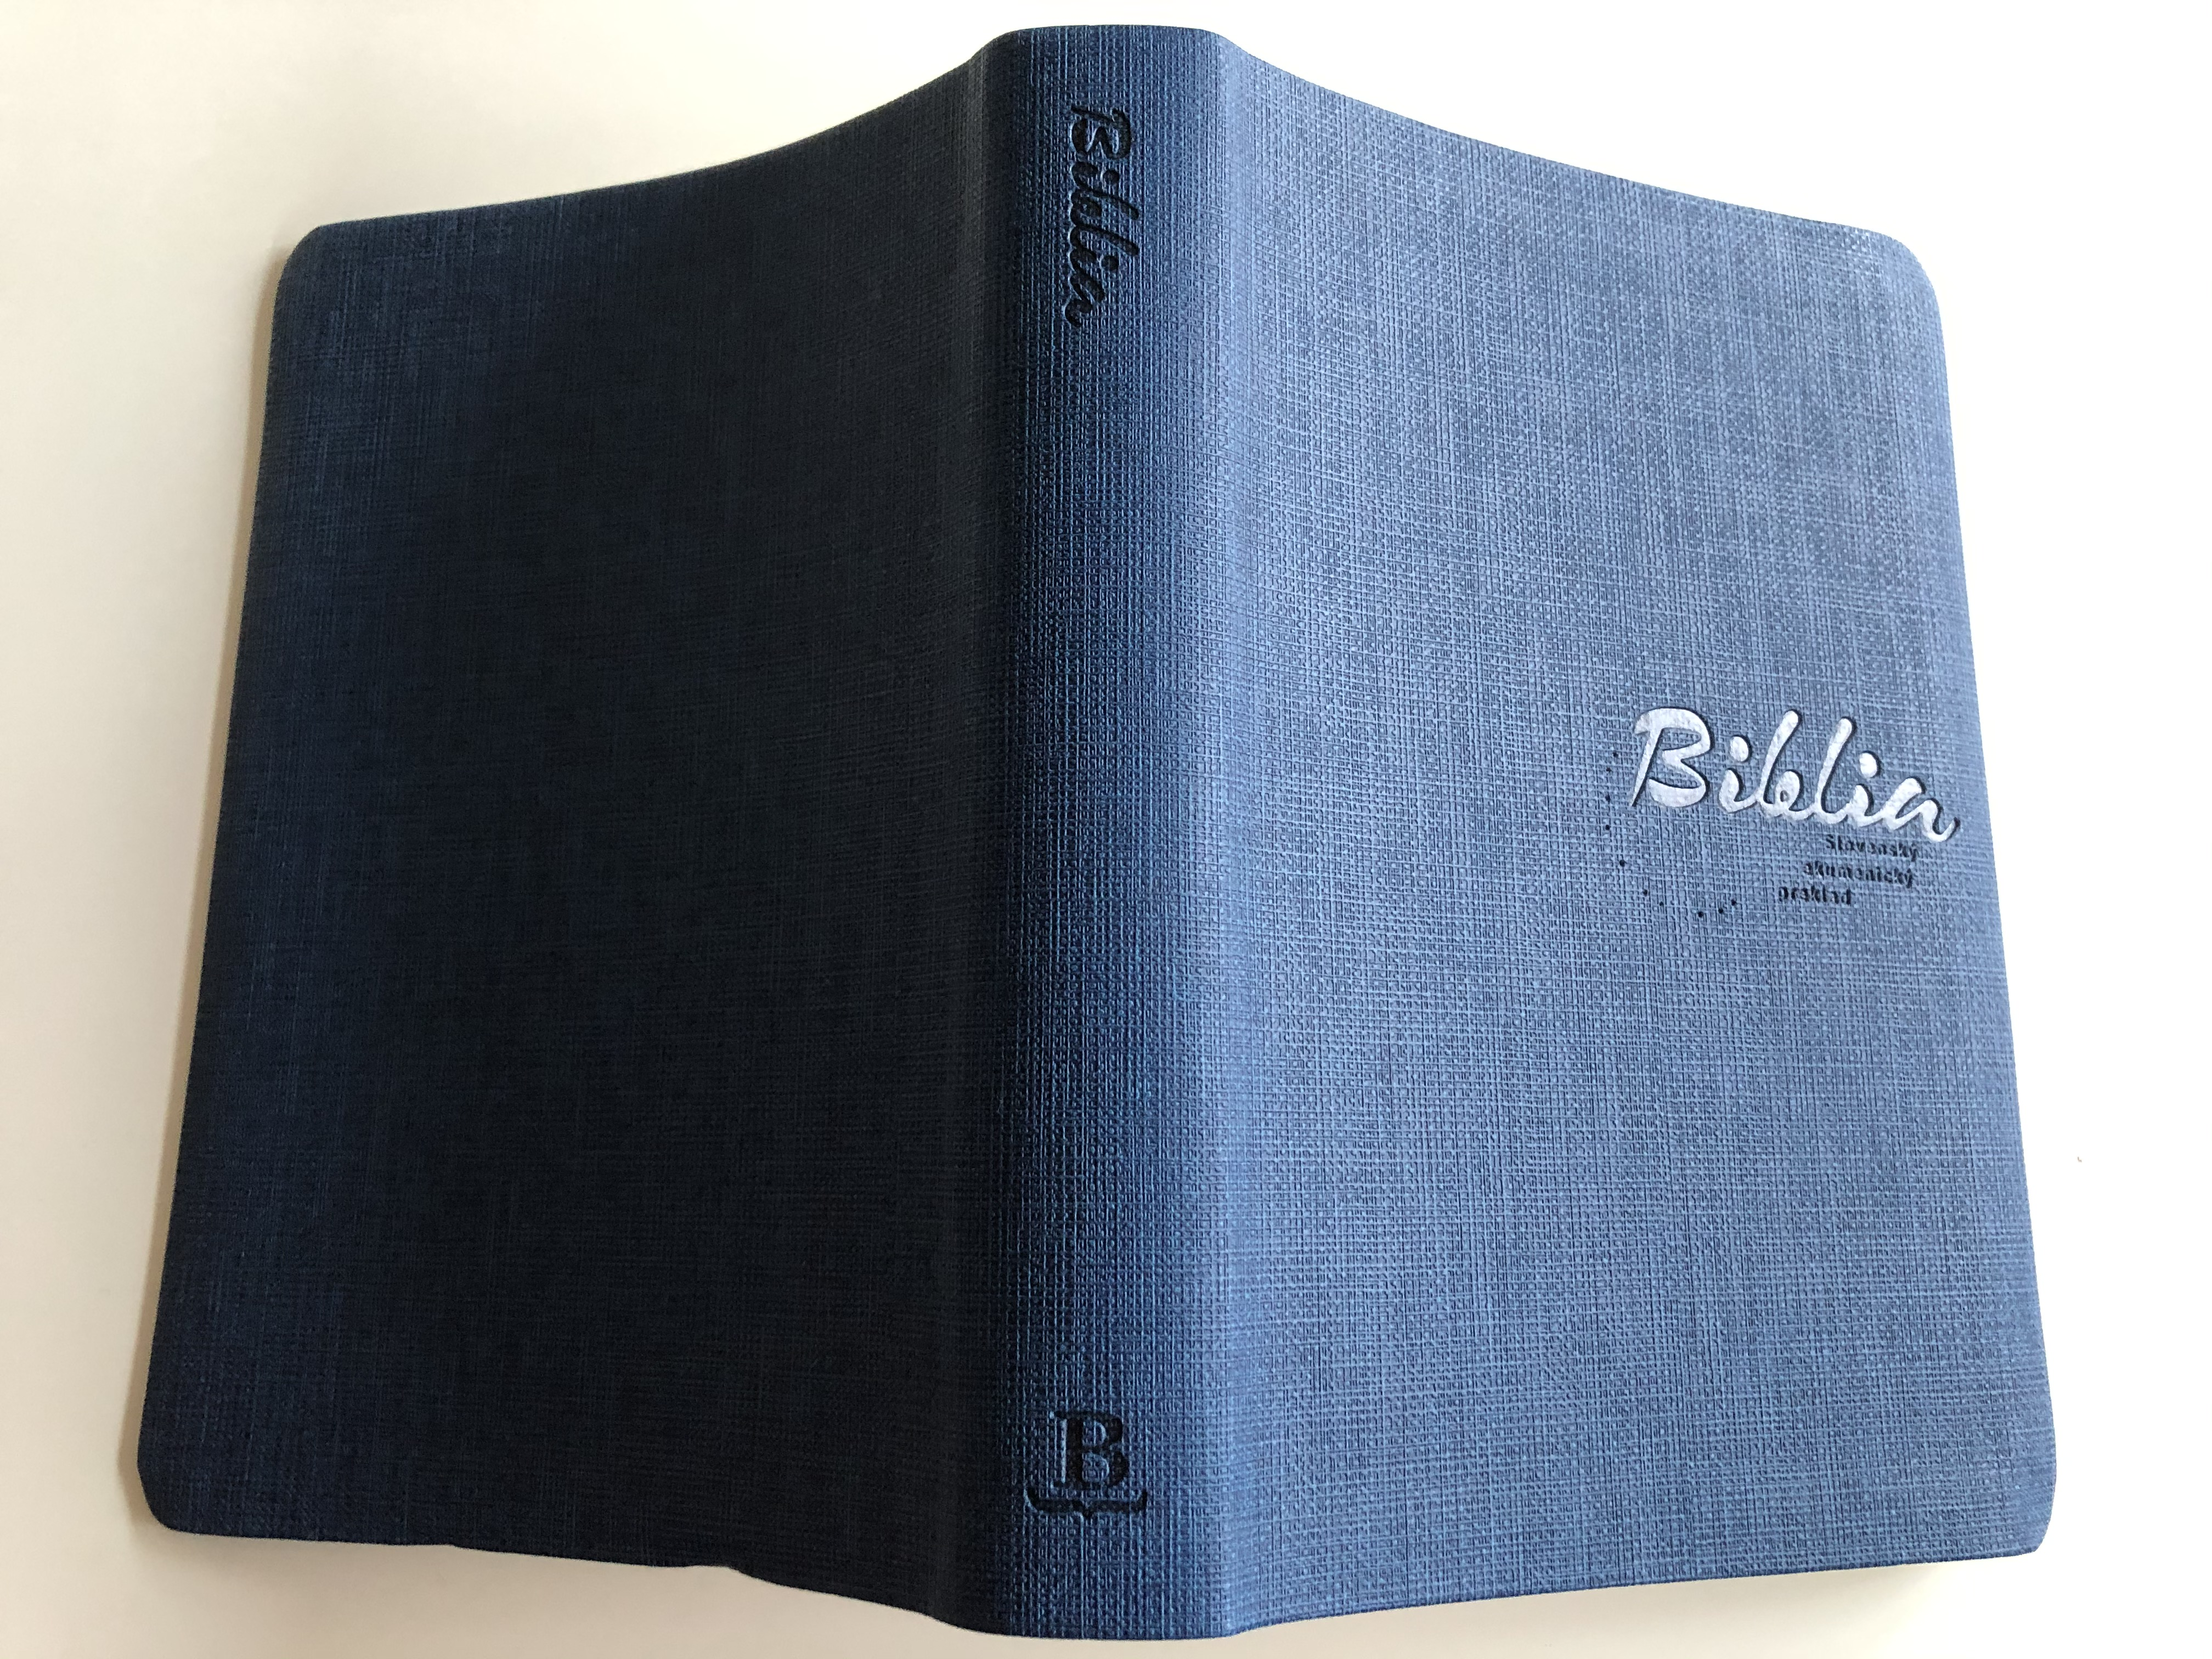 slovak-ecumenical-bible-biblia-slovensk-ekumenick-preklad-3.jpg